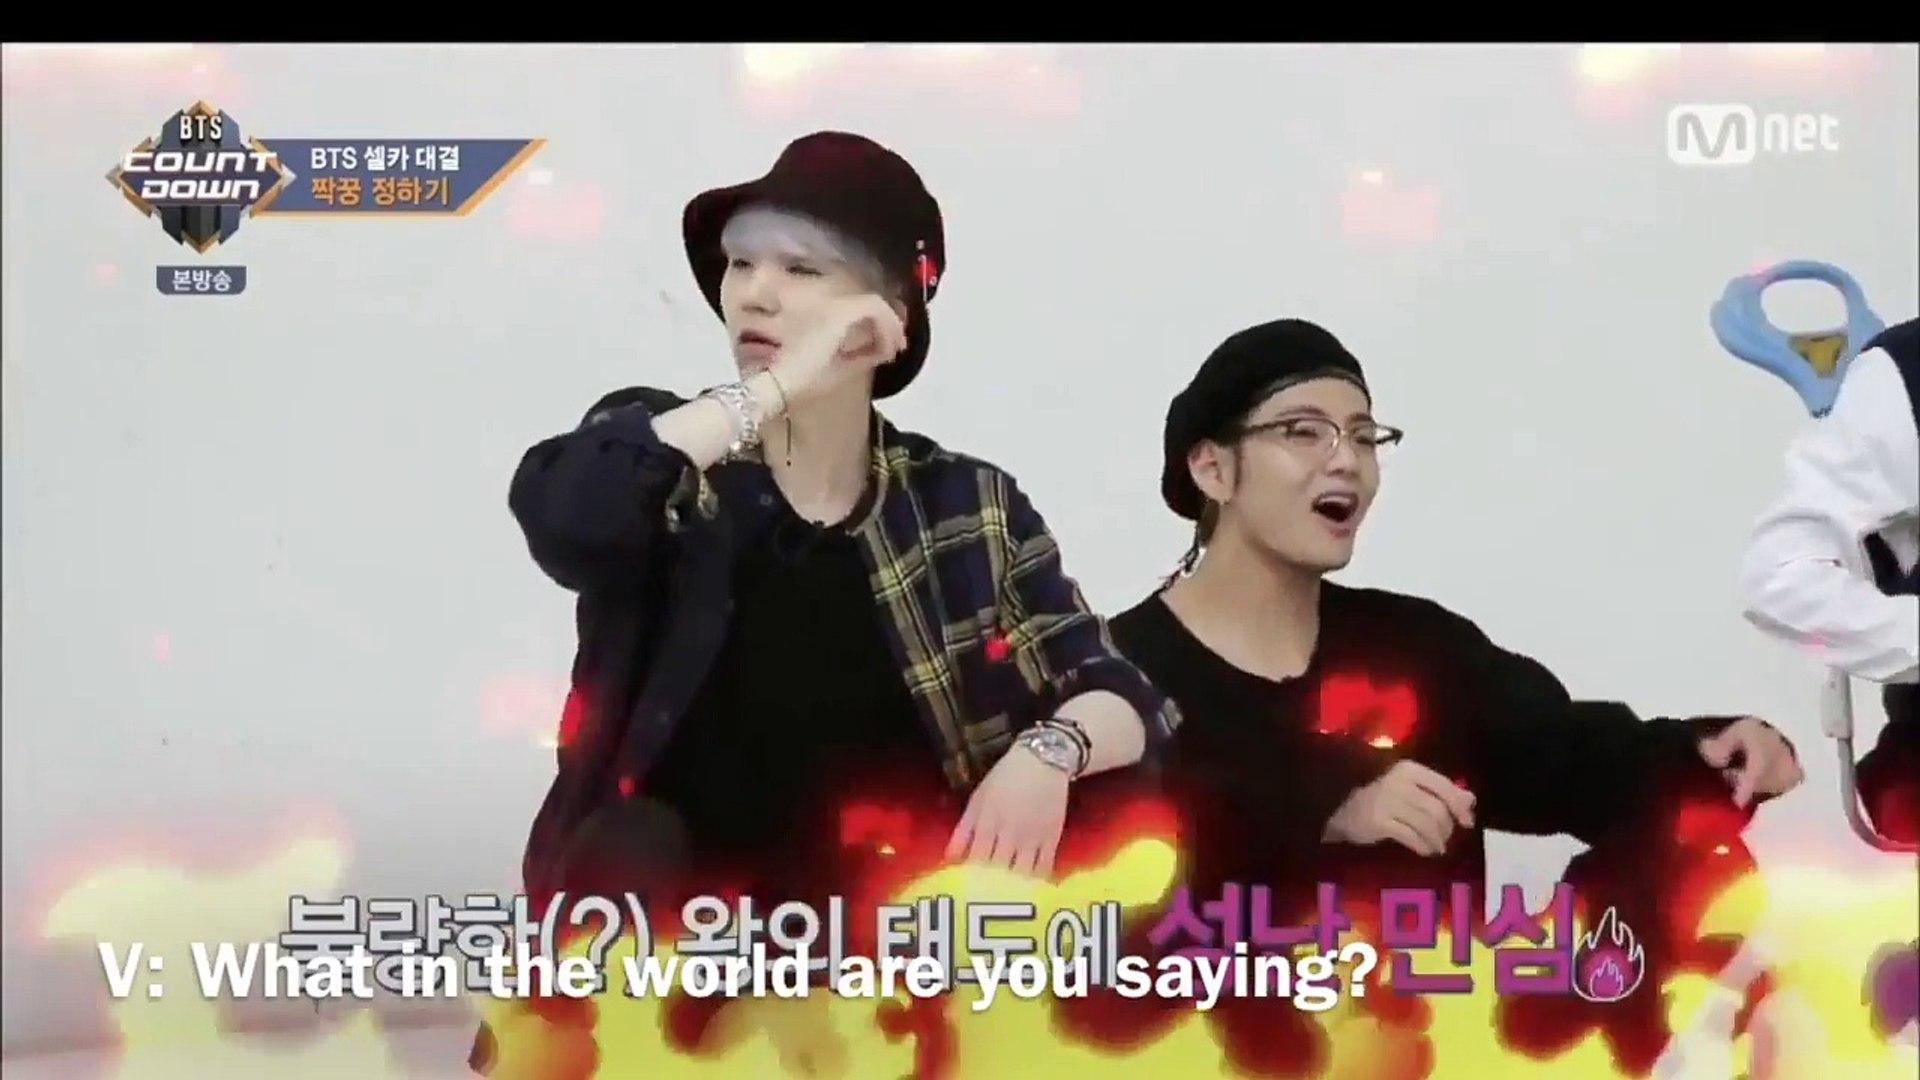 [ENG SUB] BTS Jungkook Choosing Your Partner